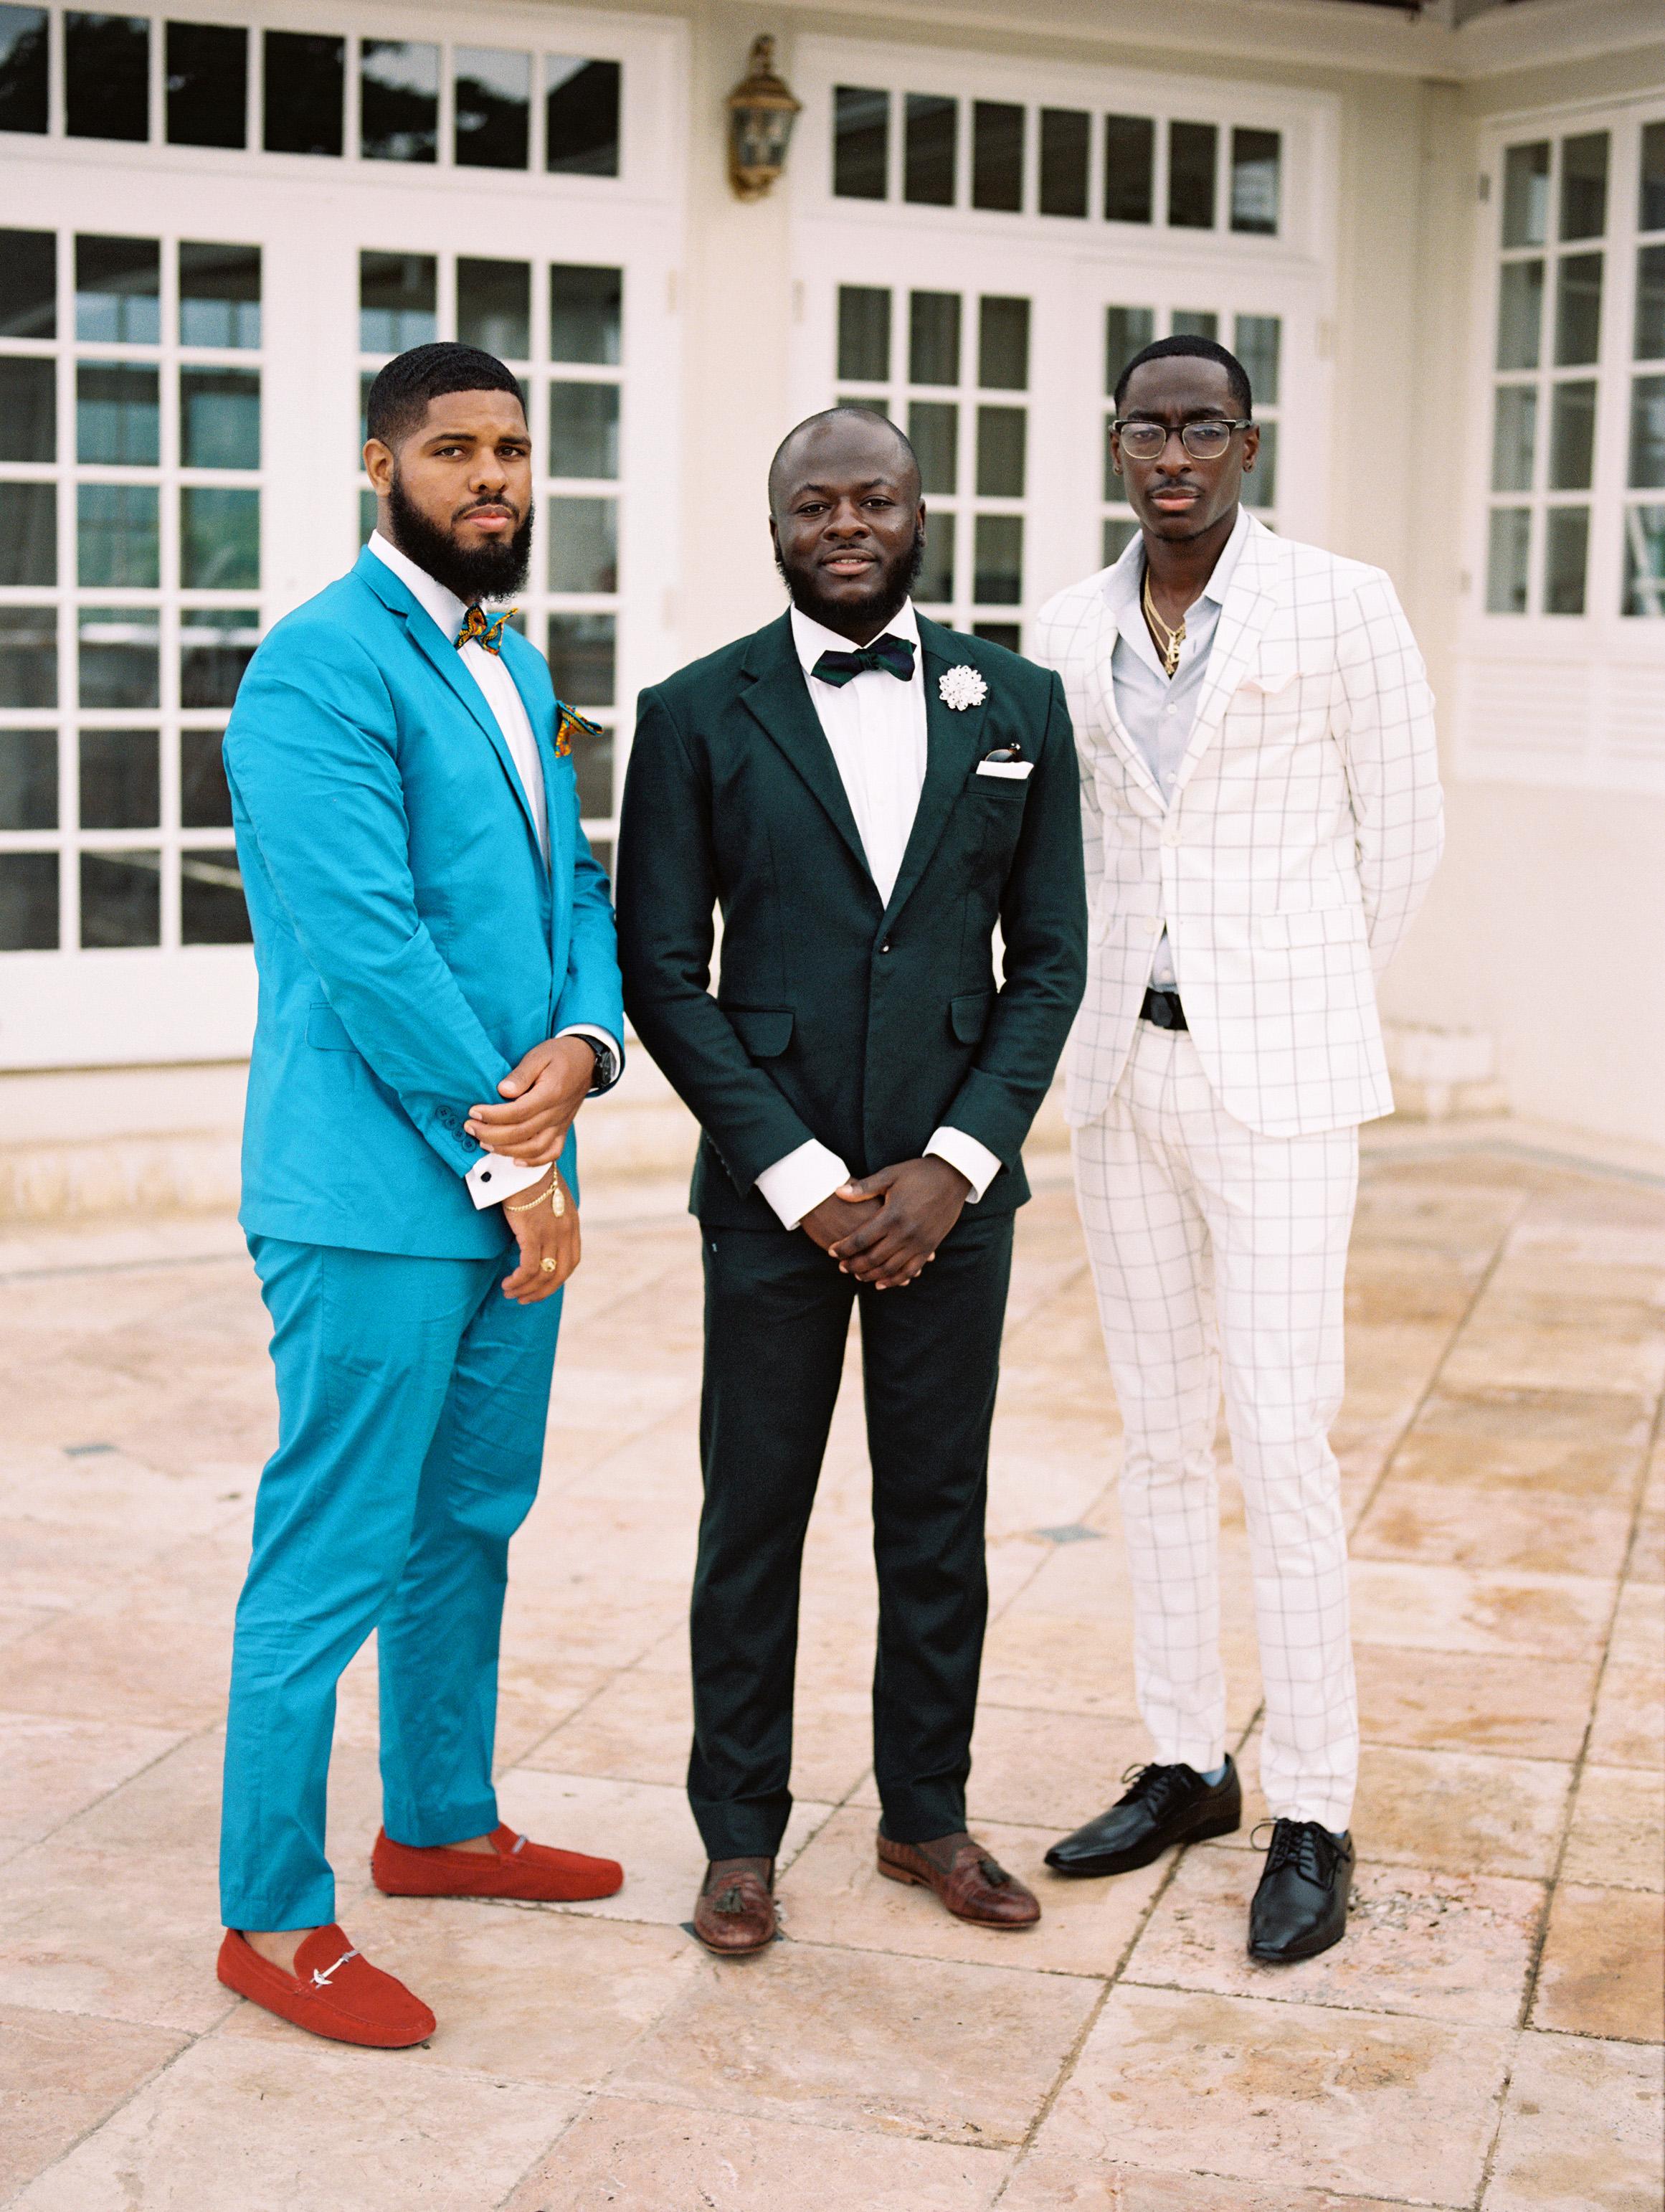 porsha terry wedding jamaica guests suits